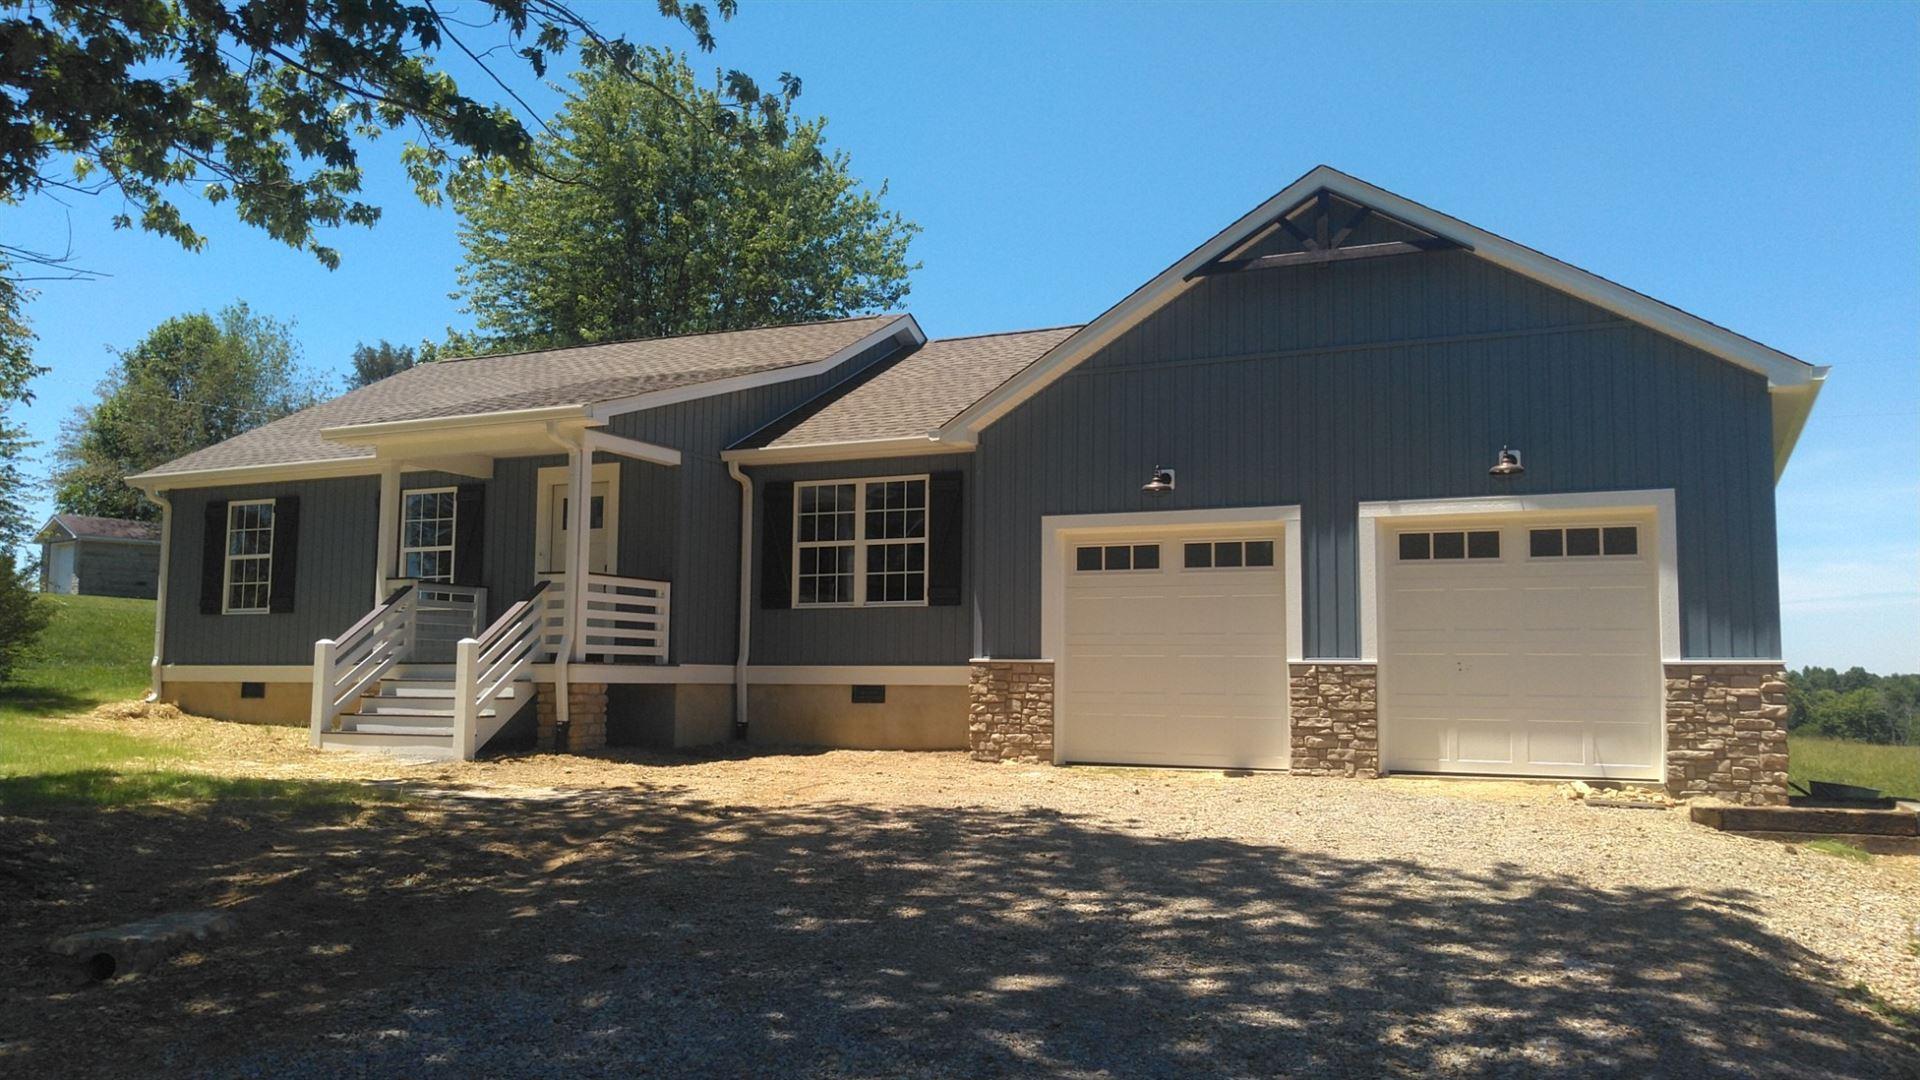 77 Poplar Grove Rd, Westmoreland, TN 37186 - MLS#: 2256571